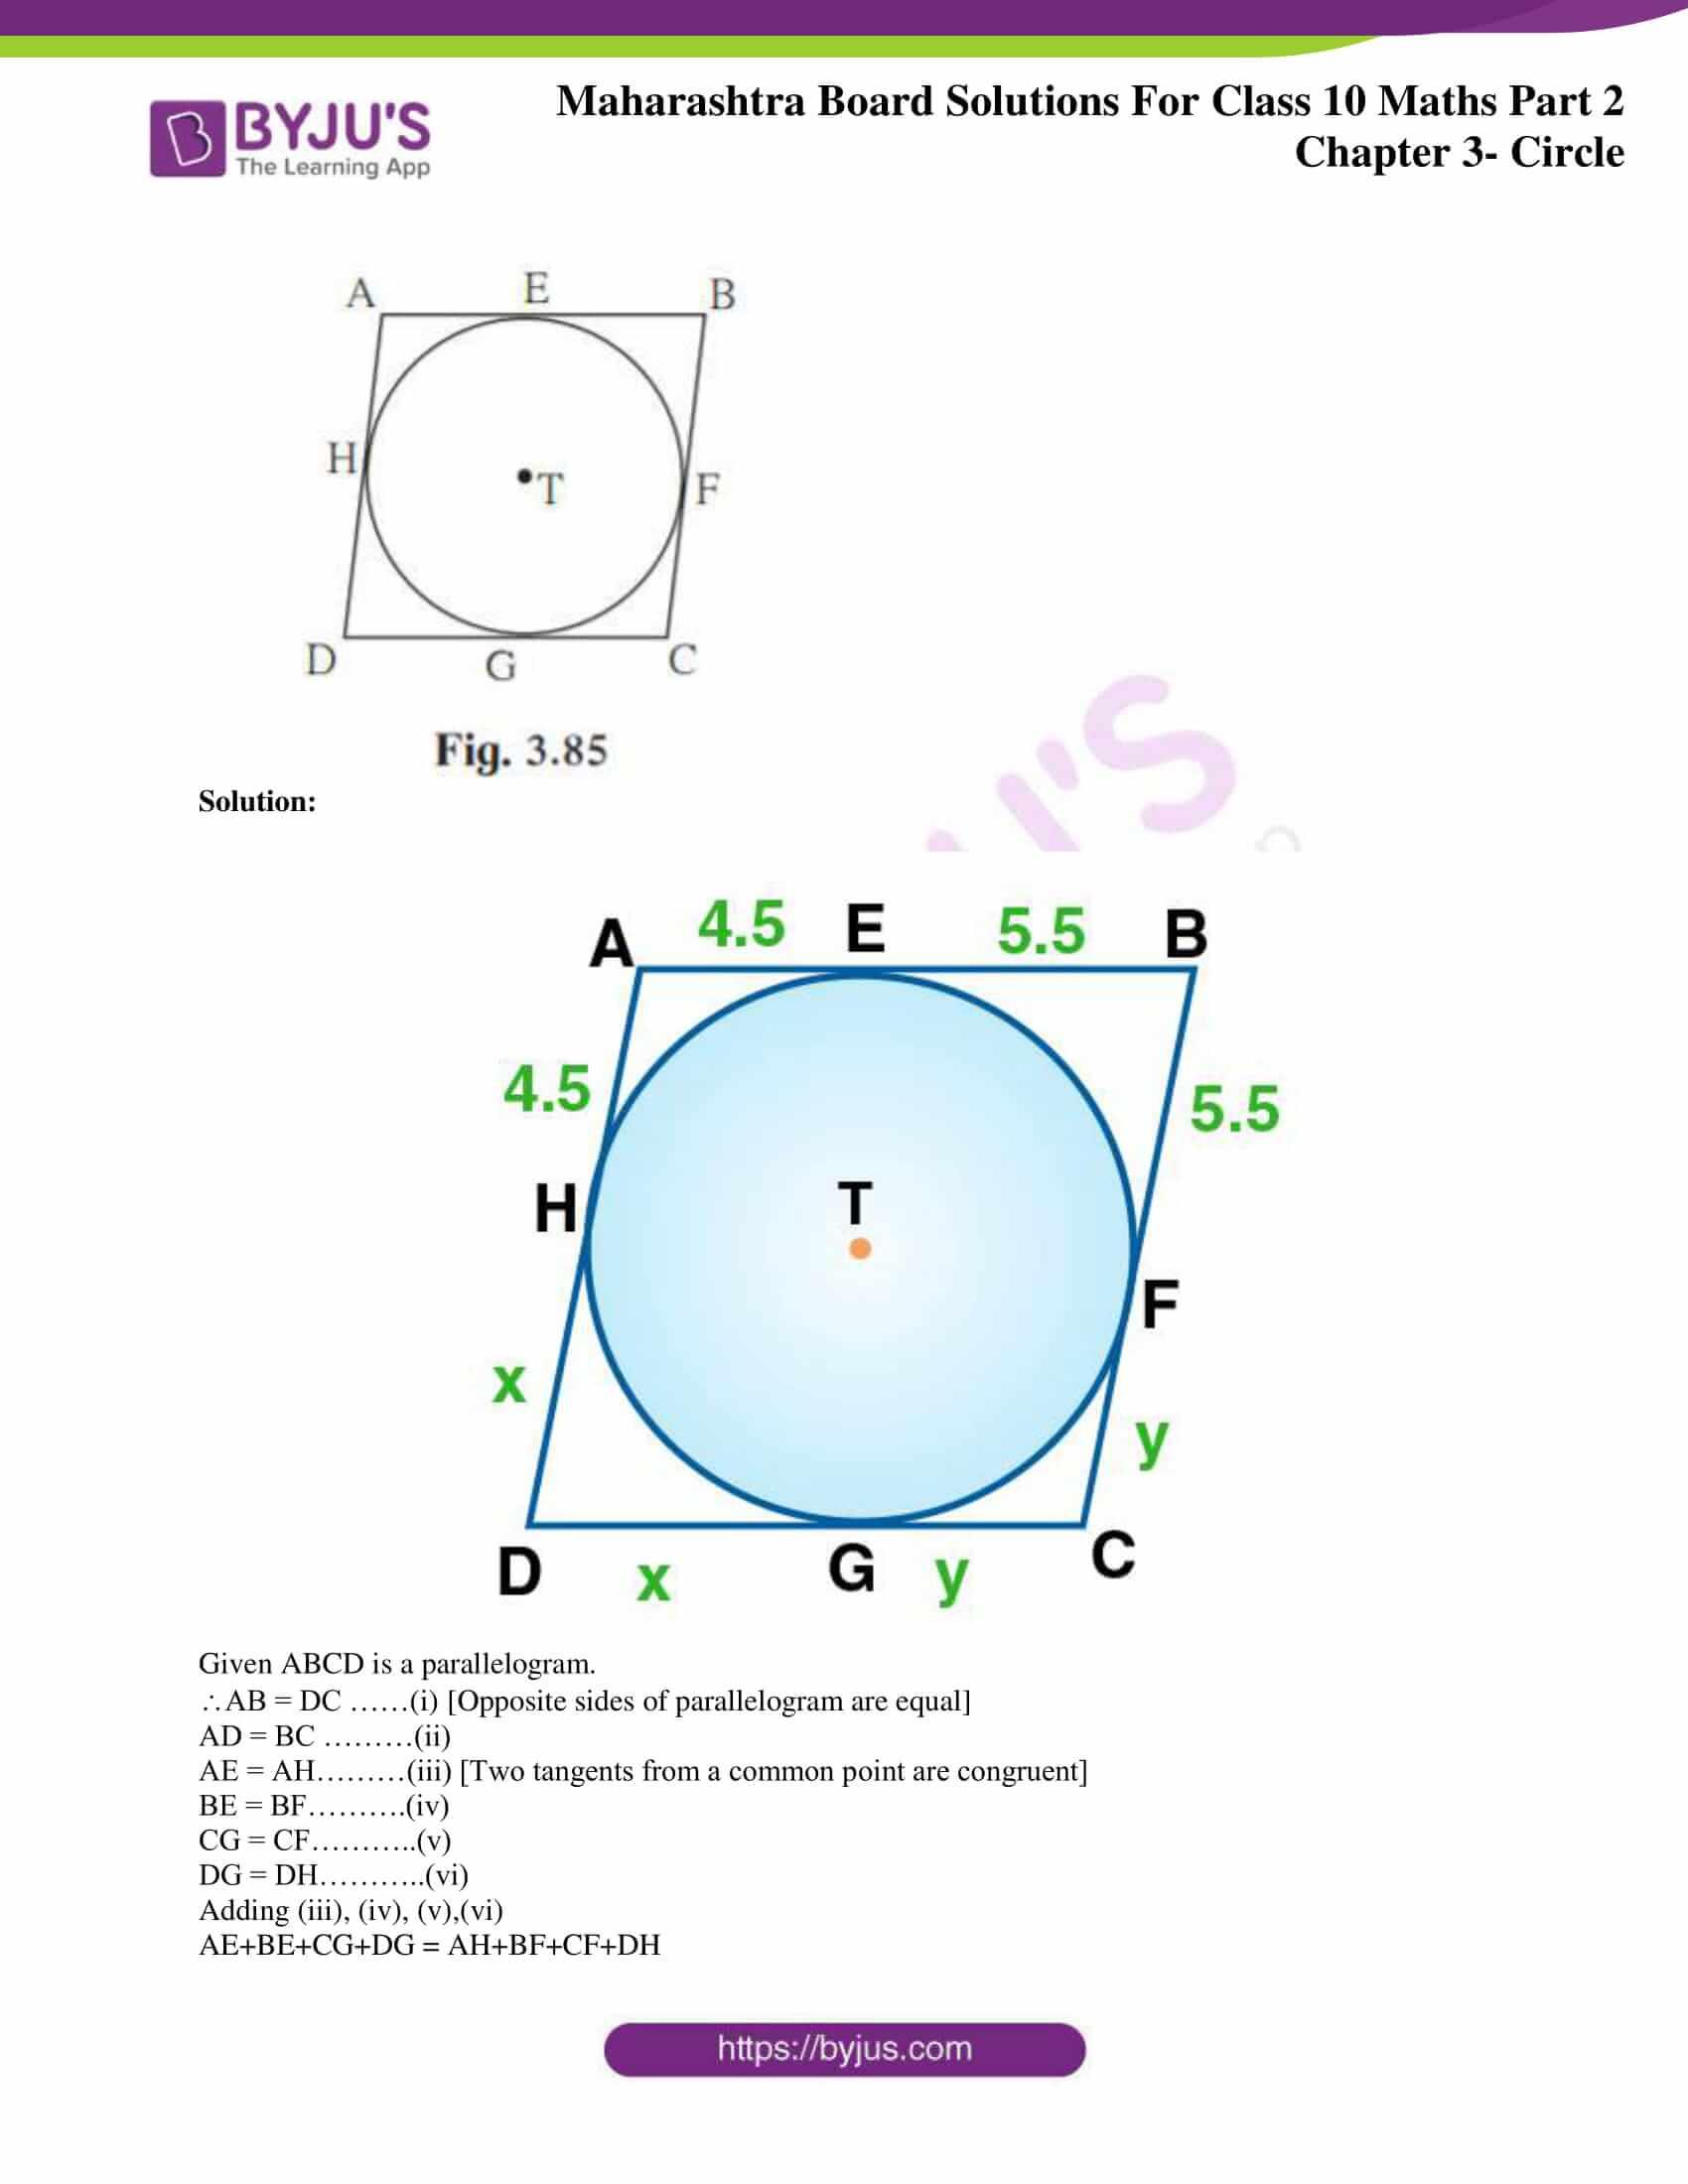 msbshse sol class 10 maths part 2 chapter 3 23